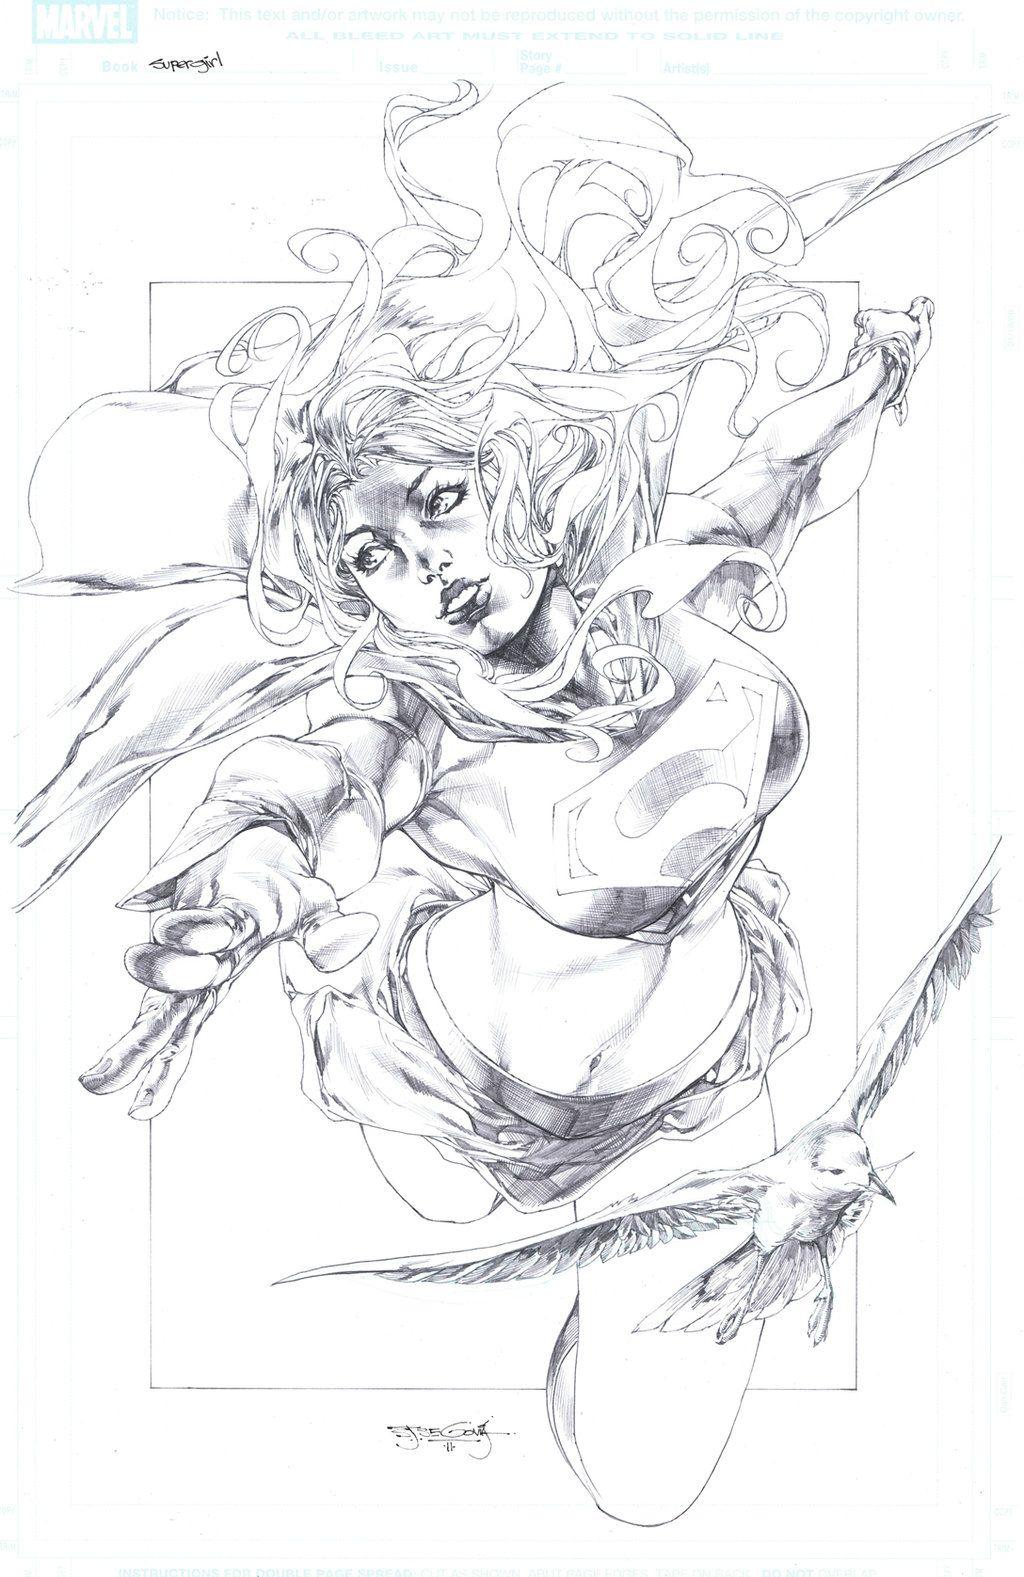 Happy Comic Book Pencil Drawing